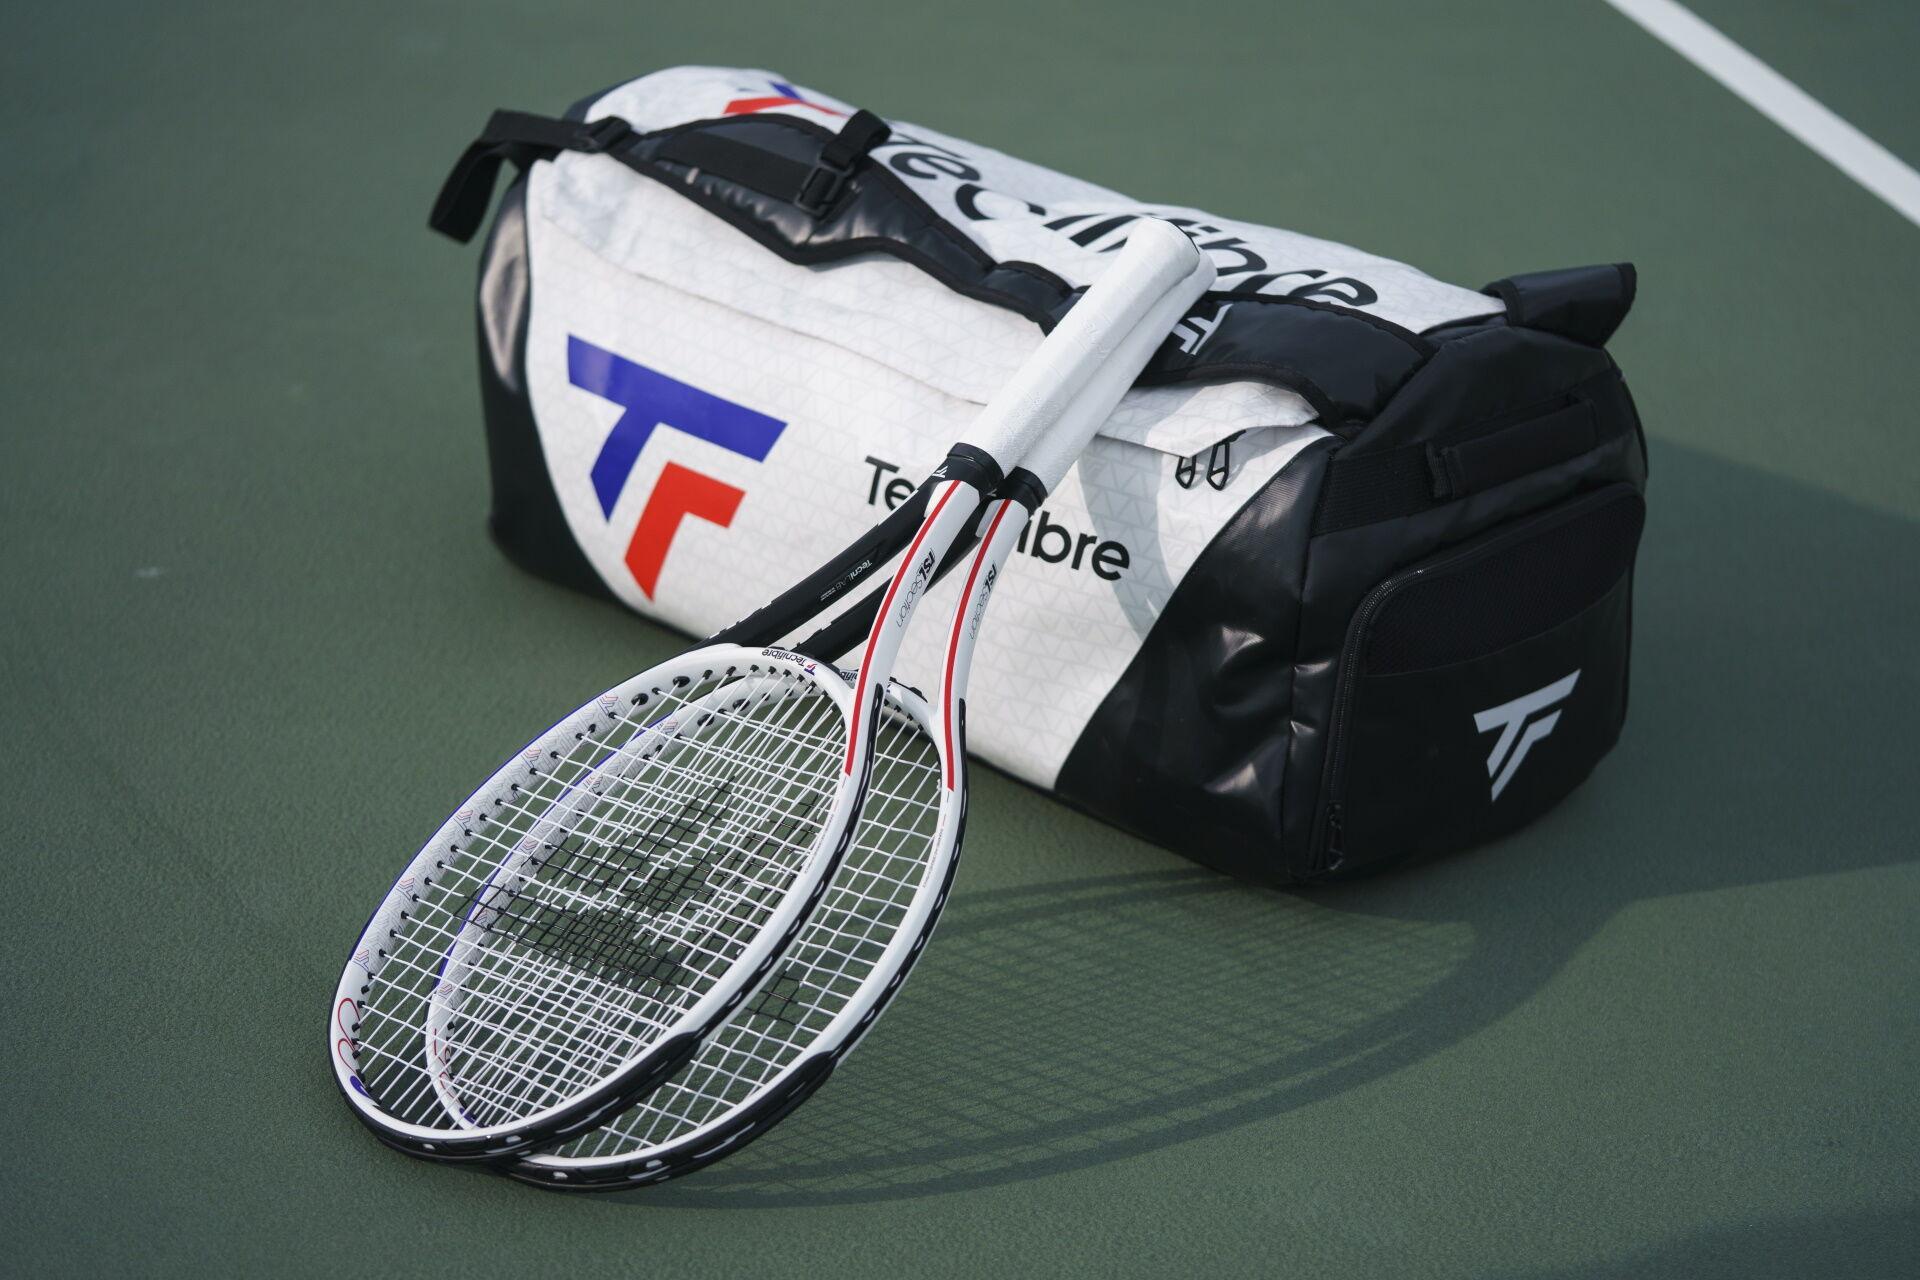 Tecnifibre TFight RS teniszütők és Tecnifibre RackPack tenisztáska